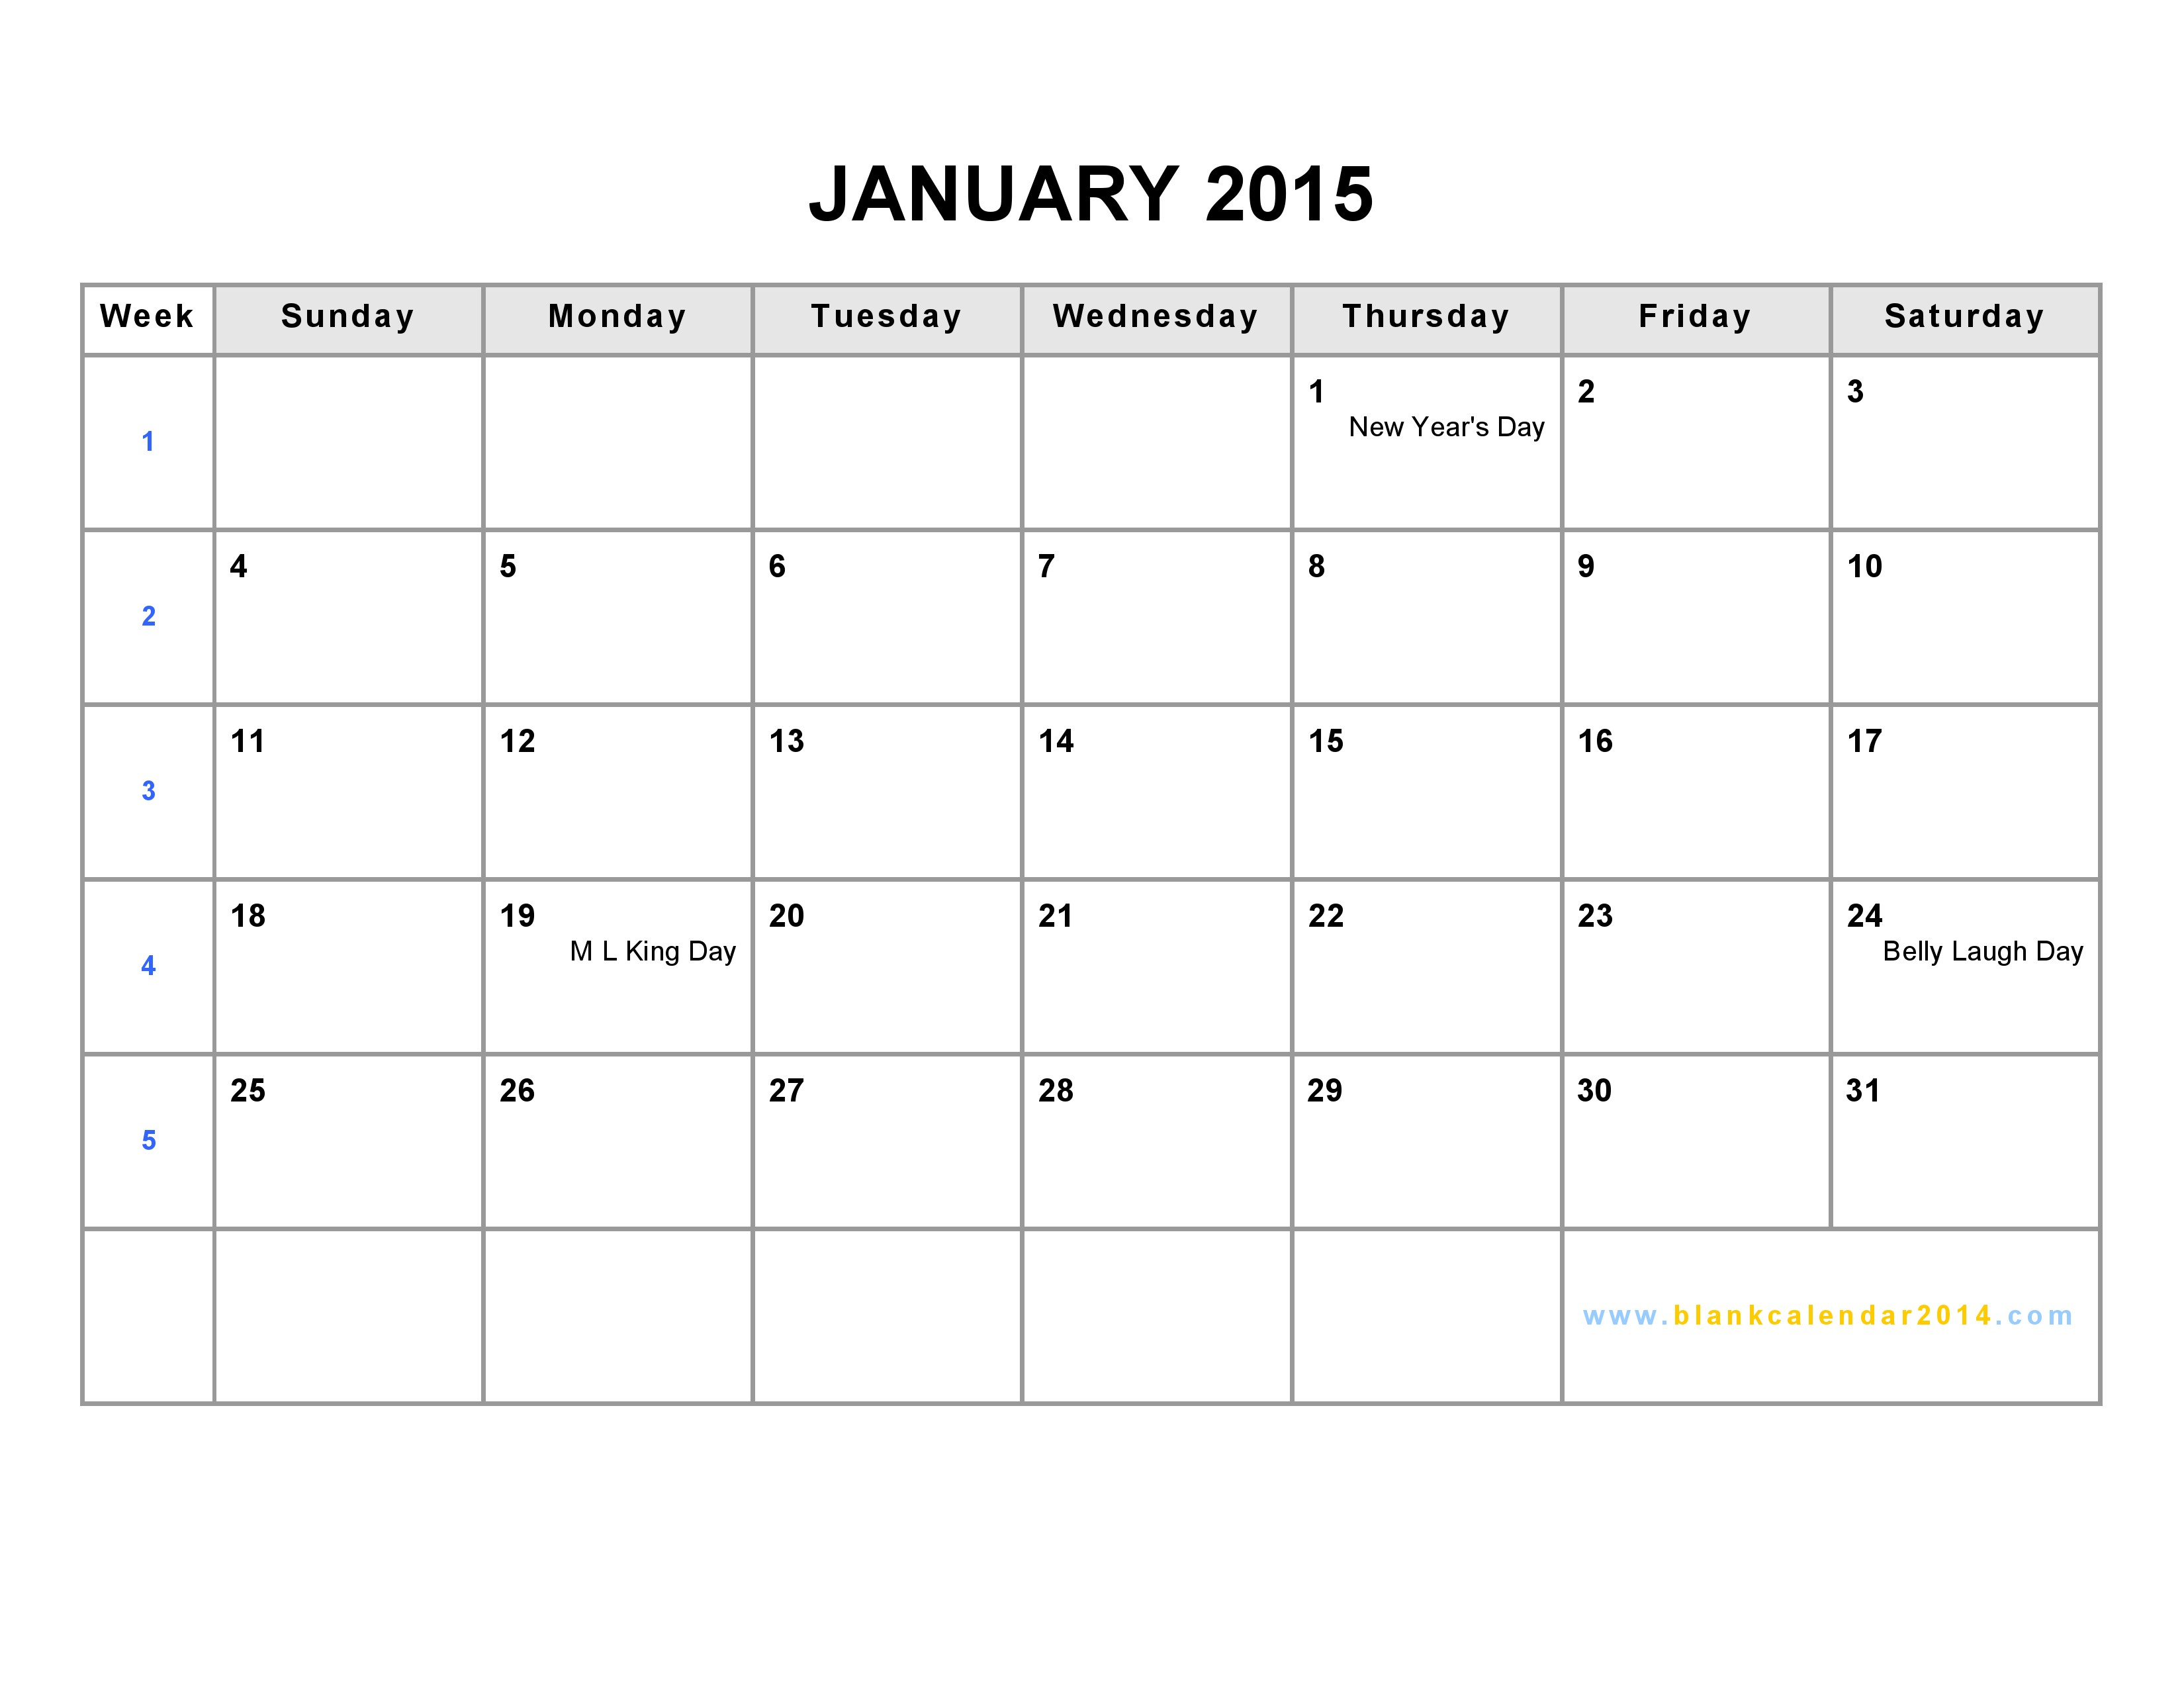 australian calendar template 2015 - calendar january 2015 printable the